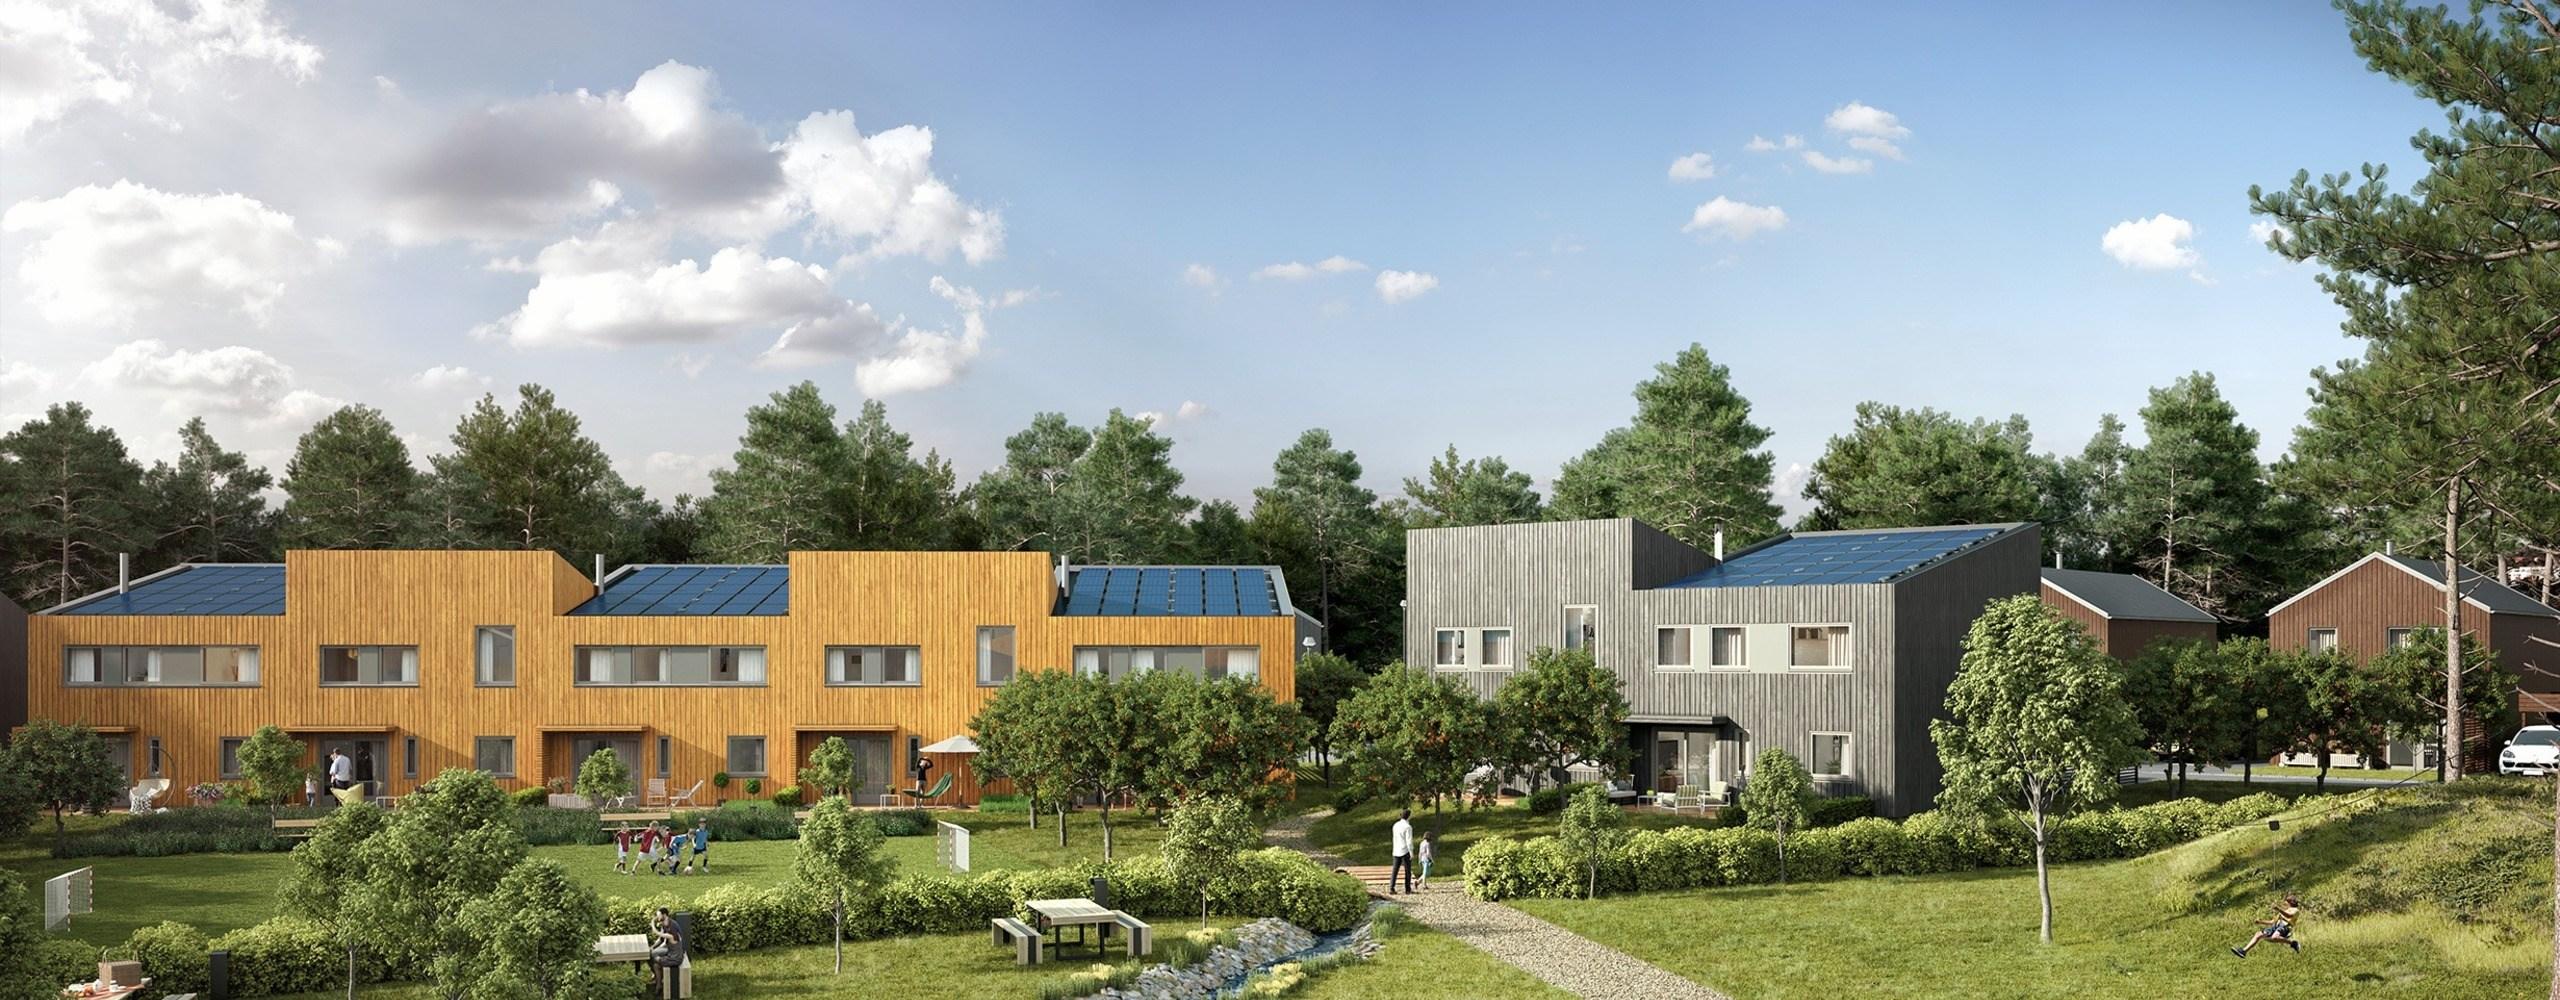 På Furumo får 72 boliger solcellepaneler